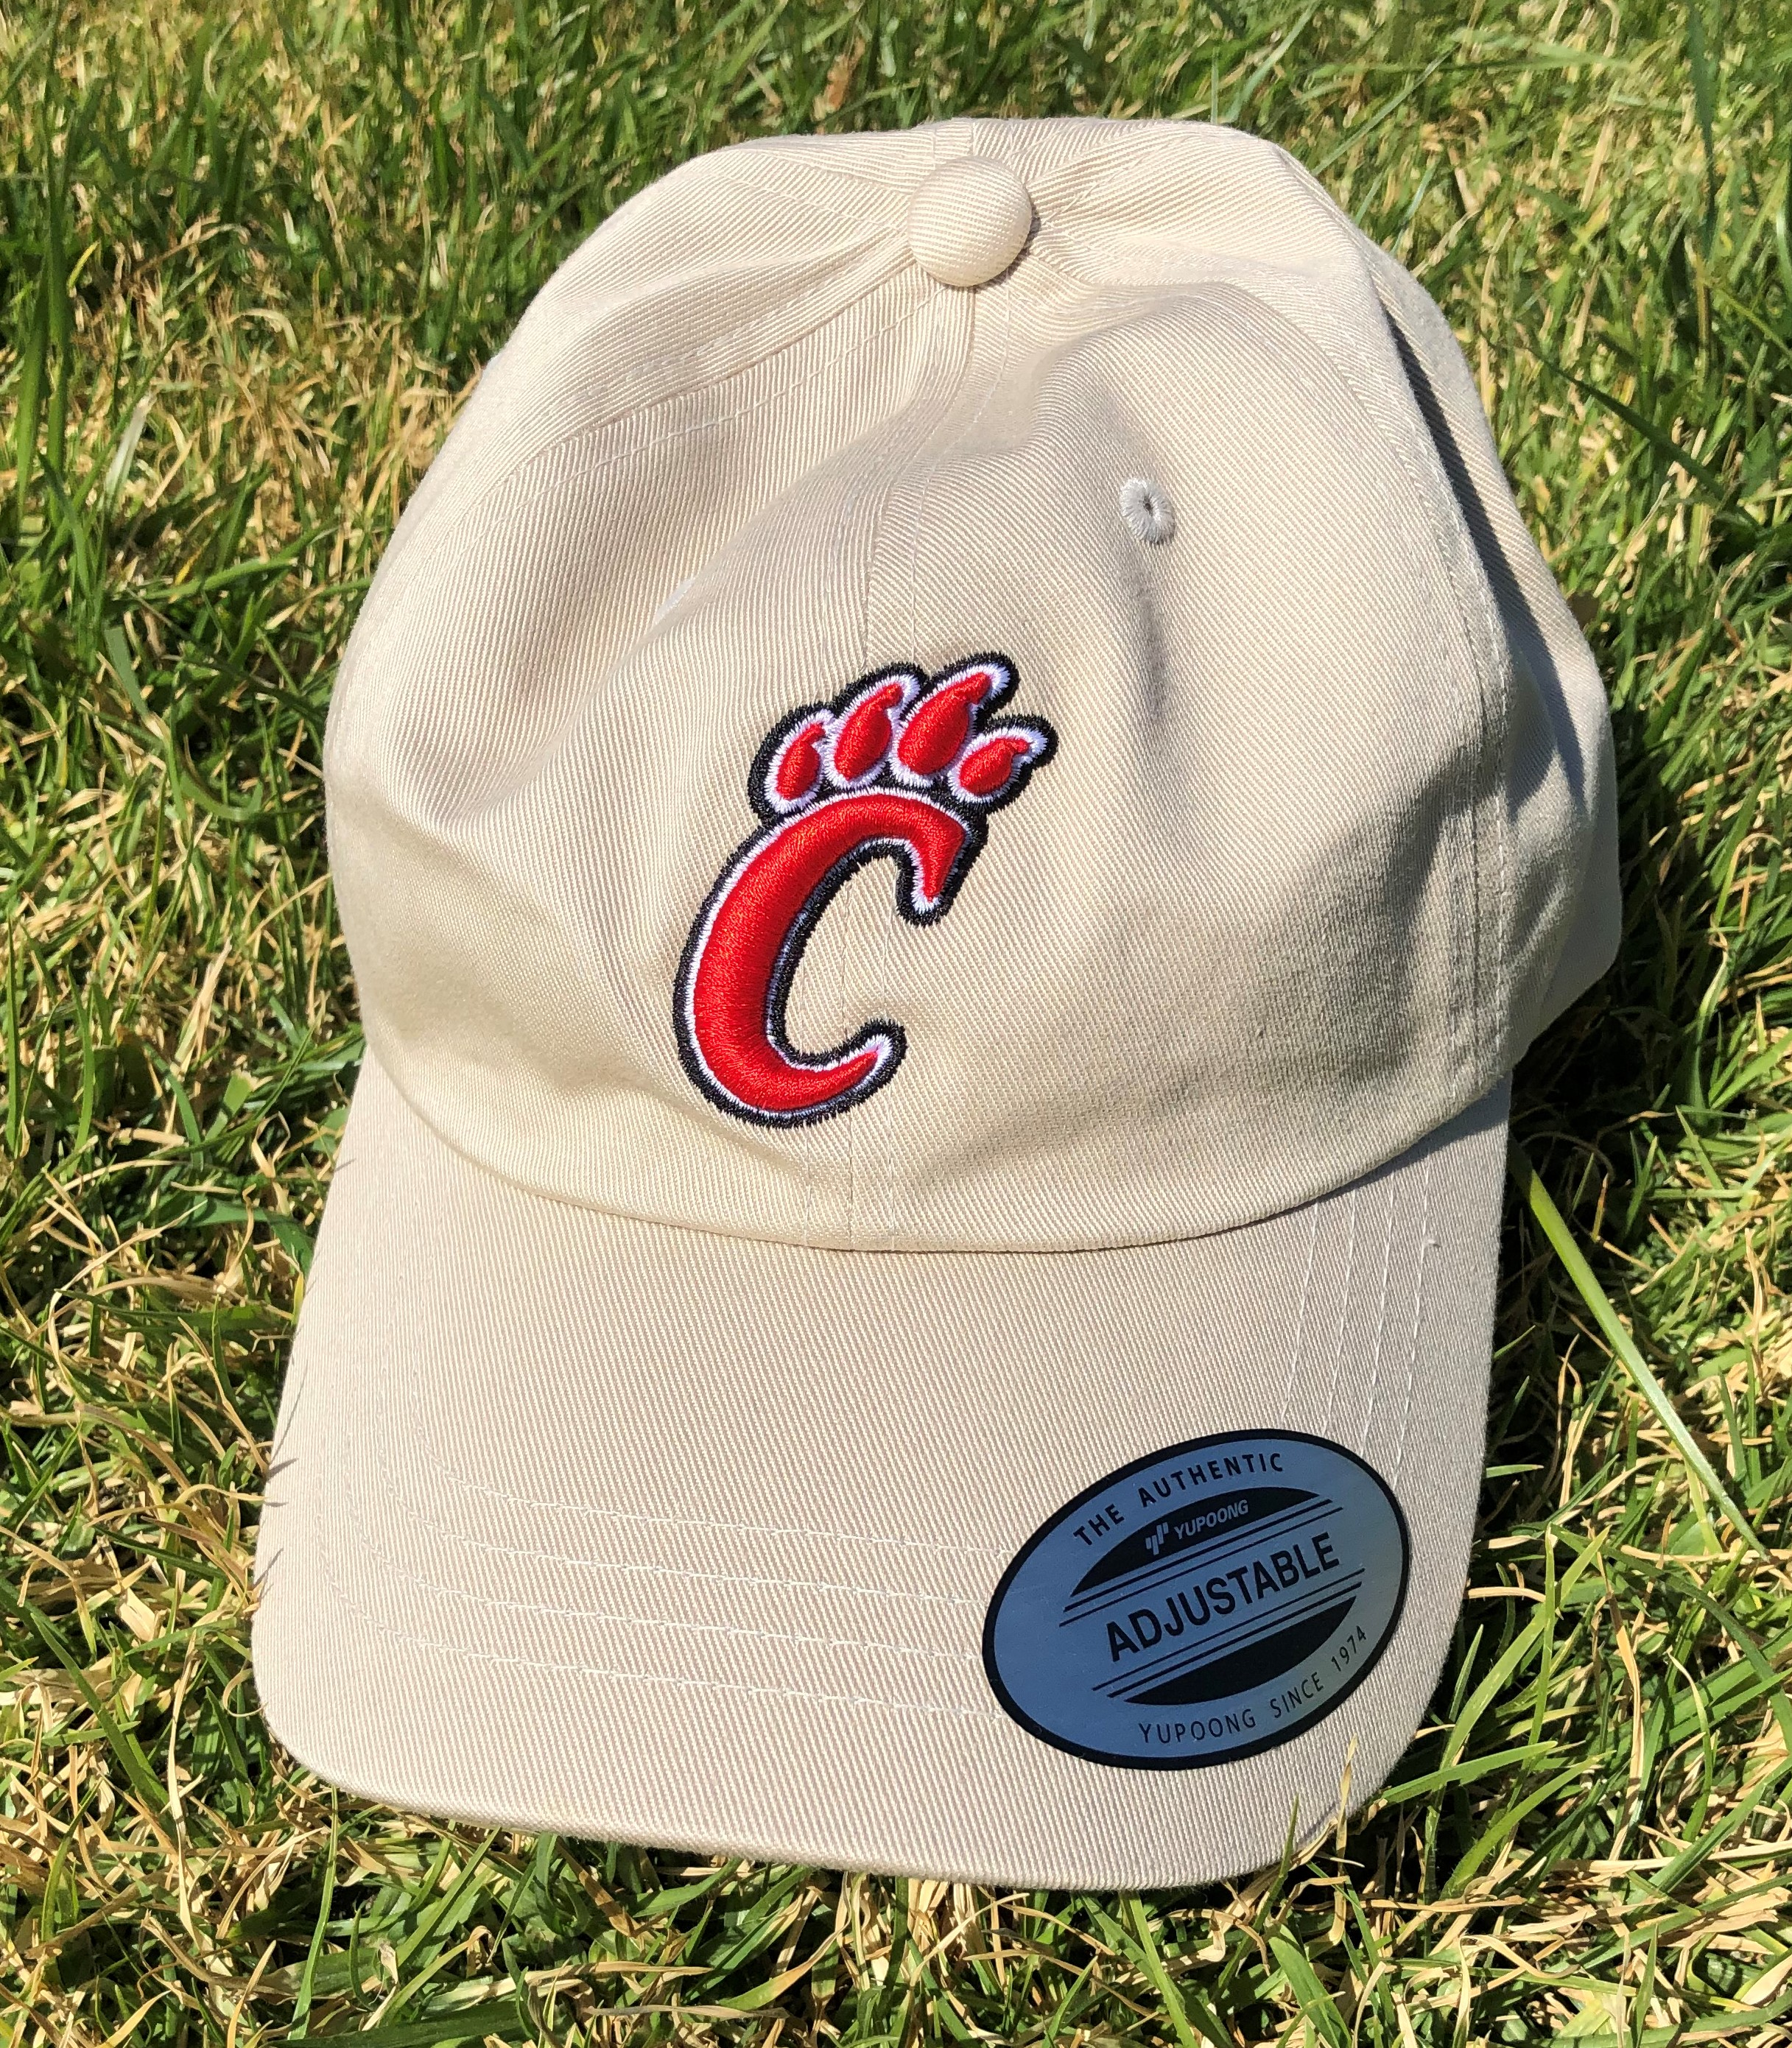 tan baseball cap with C paw print logo